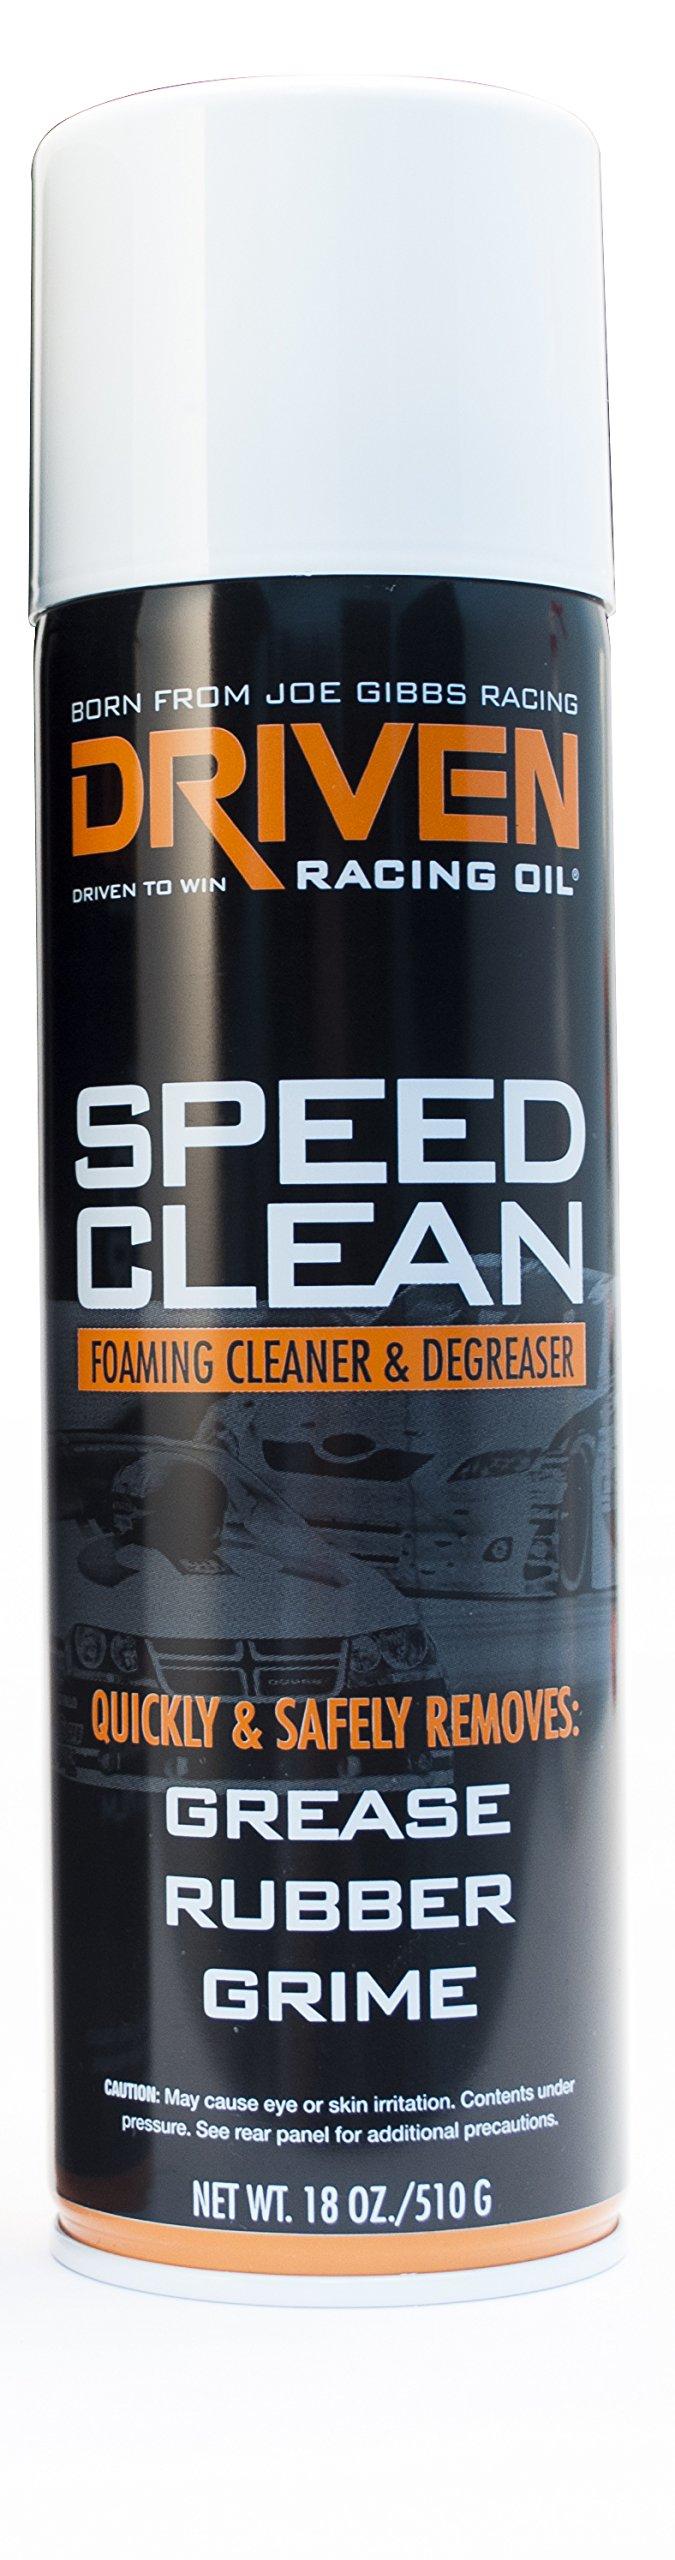 DRIVEN Joe Gibbs Racing Oil 50010 Foamy Degreaser Aerosol Can - 510g Can